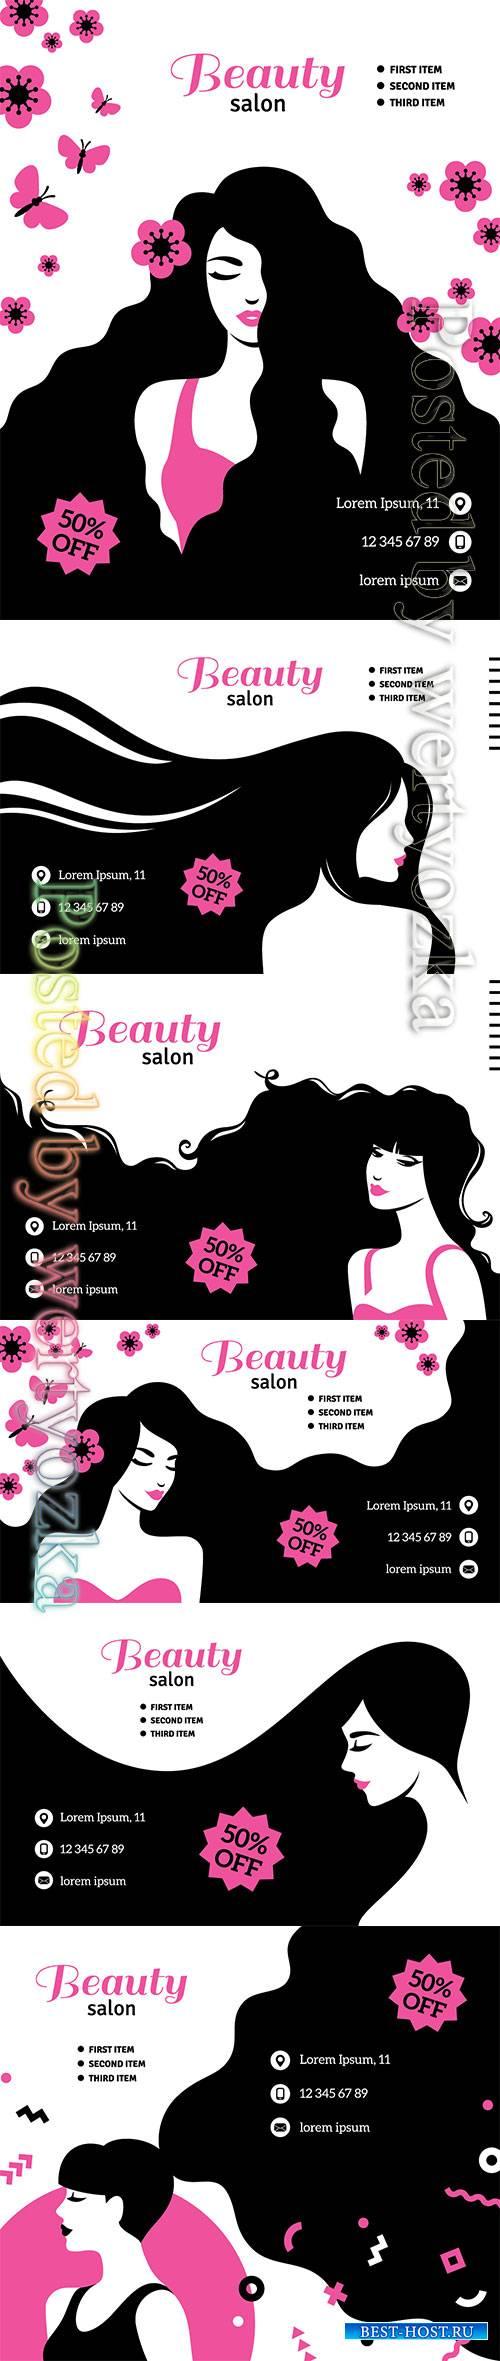 Fashion woman card template, beauty salon